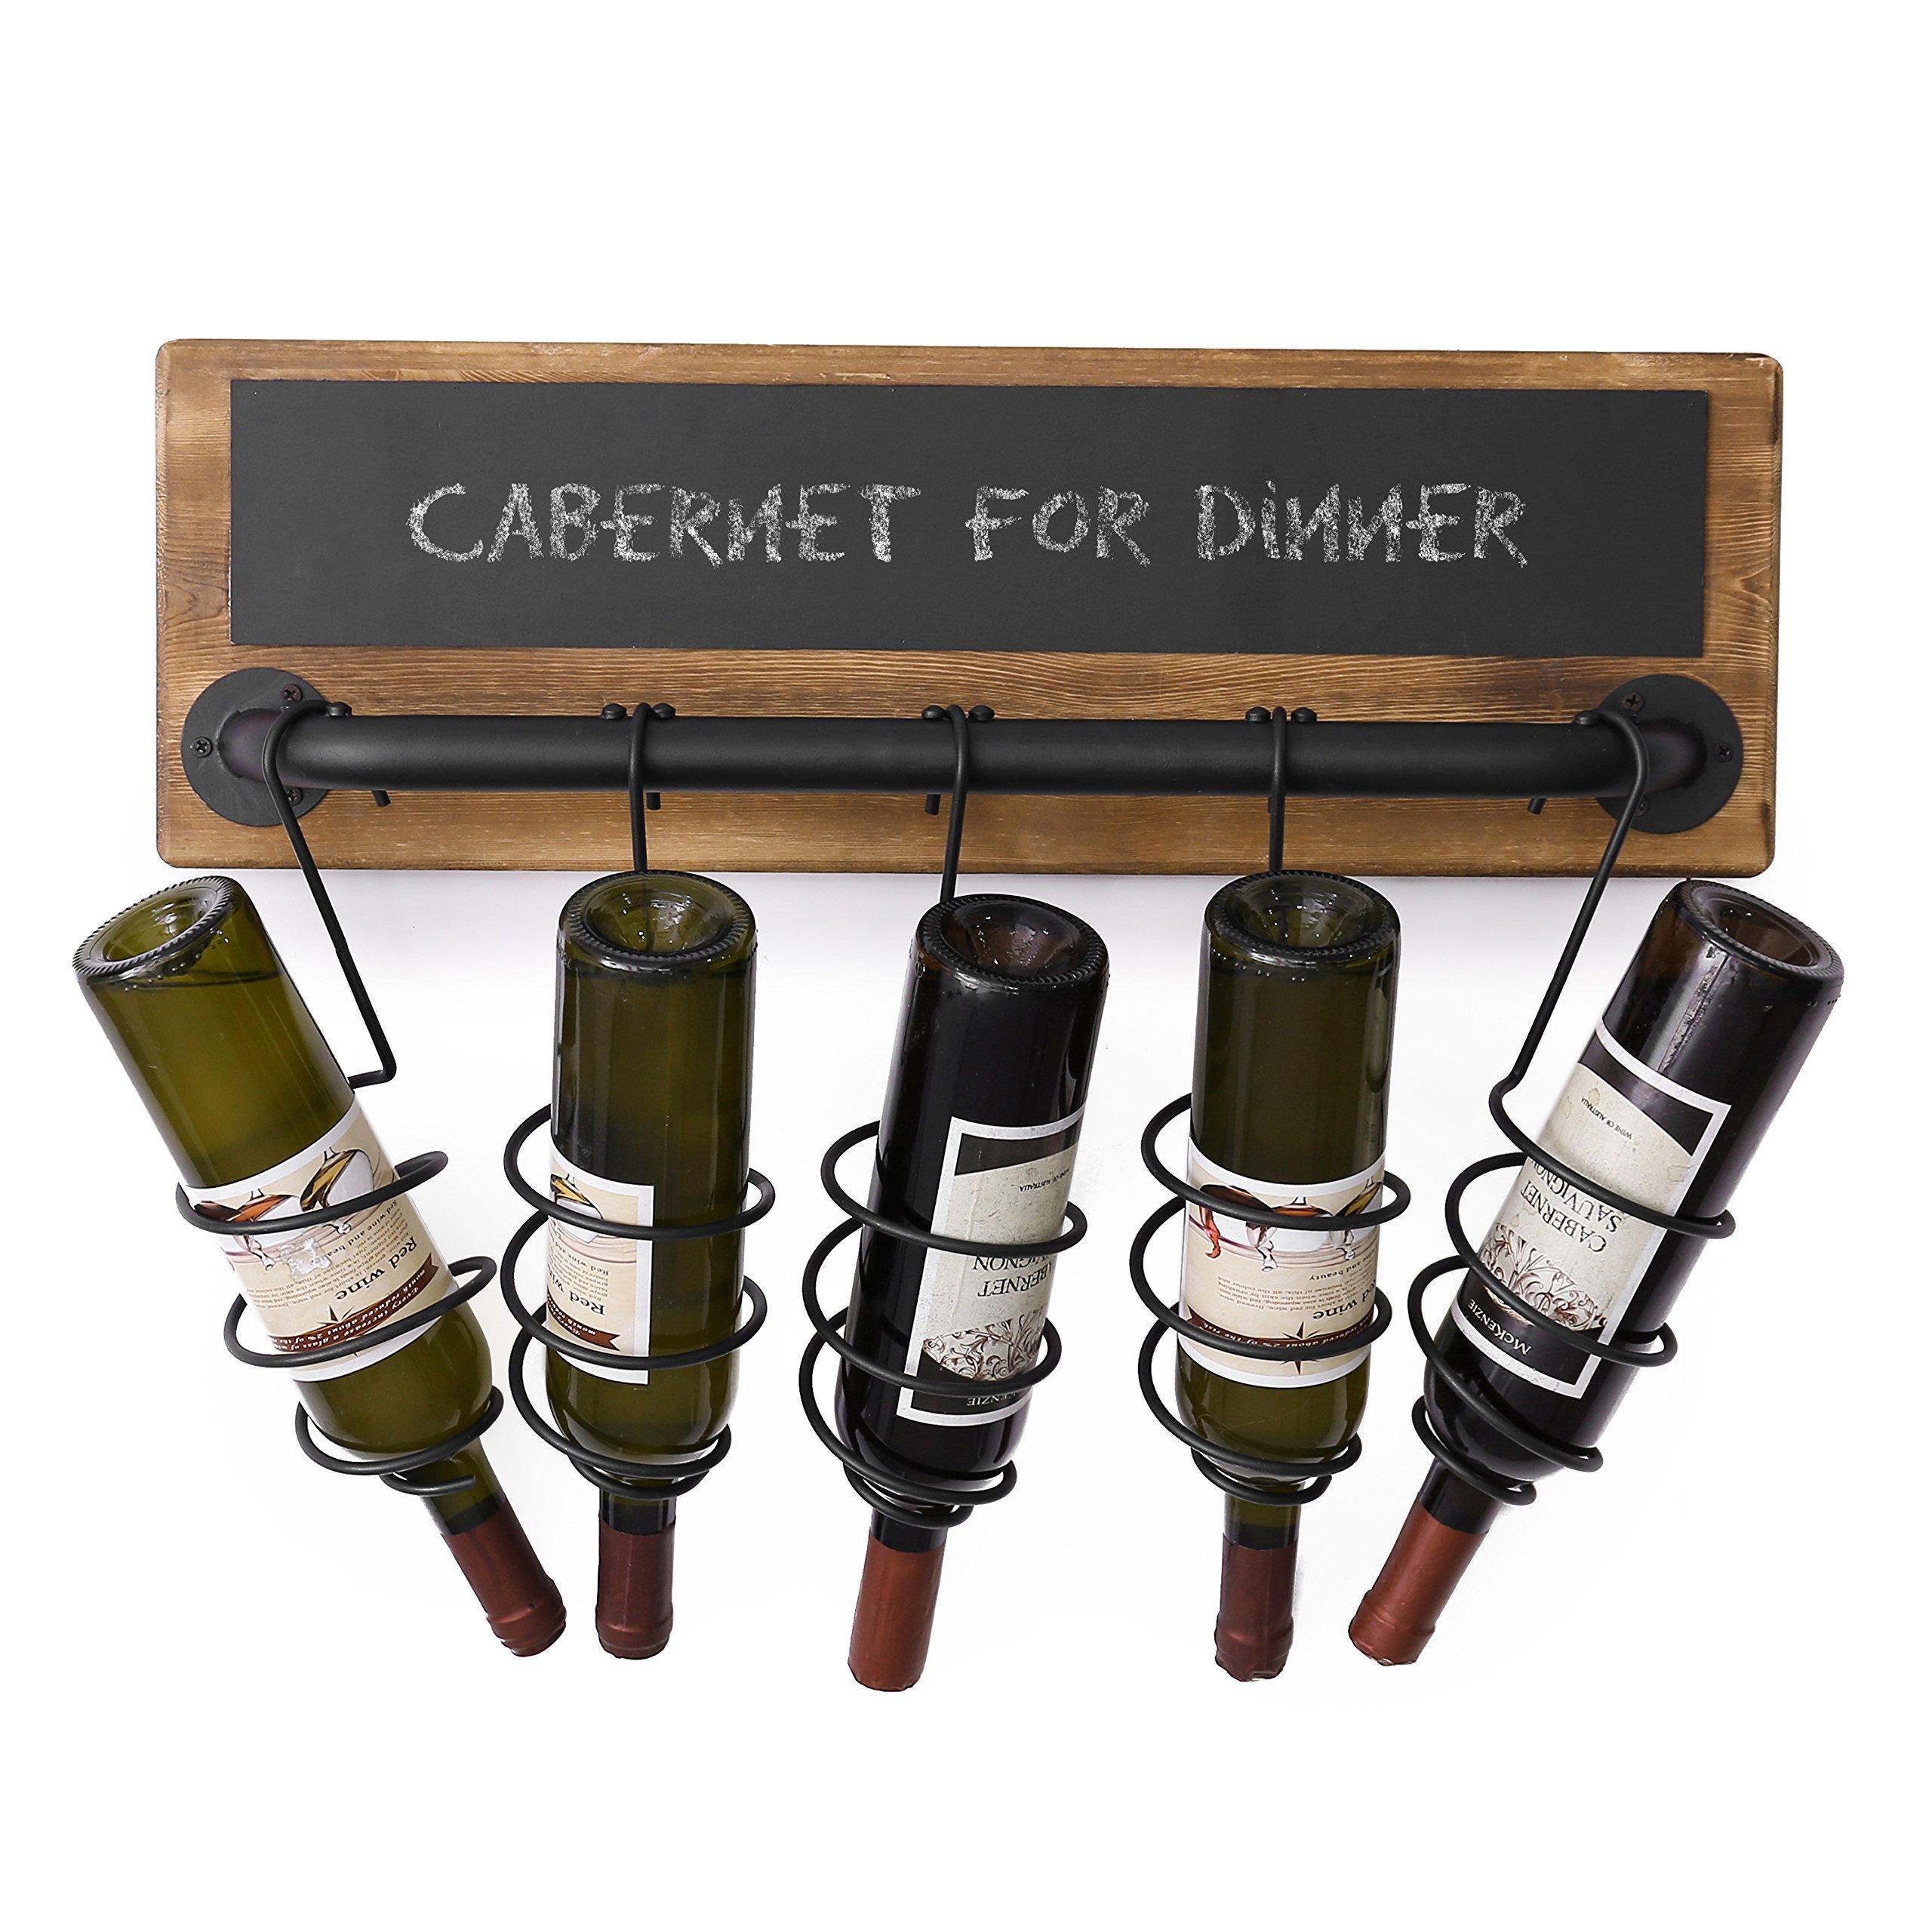 MyGift 5-Bottle Industrial Wood & Pipe Design Wall Mounted Wine Bottle Rack with Chalkboard Label